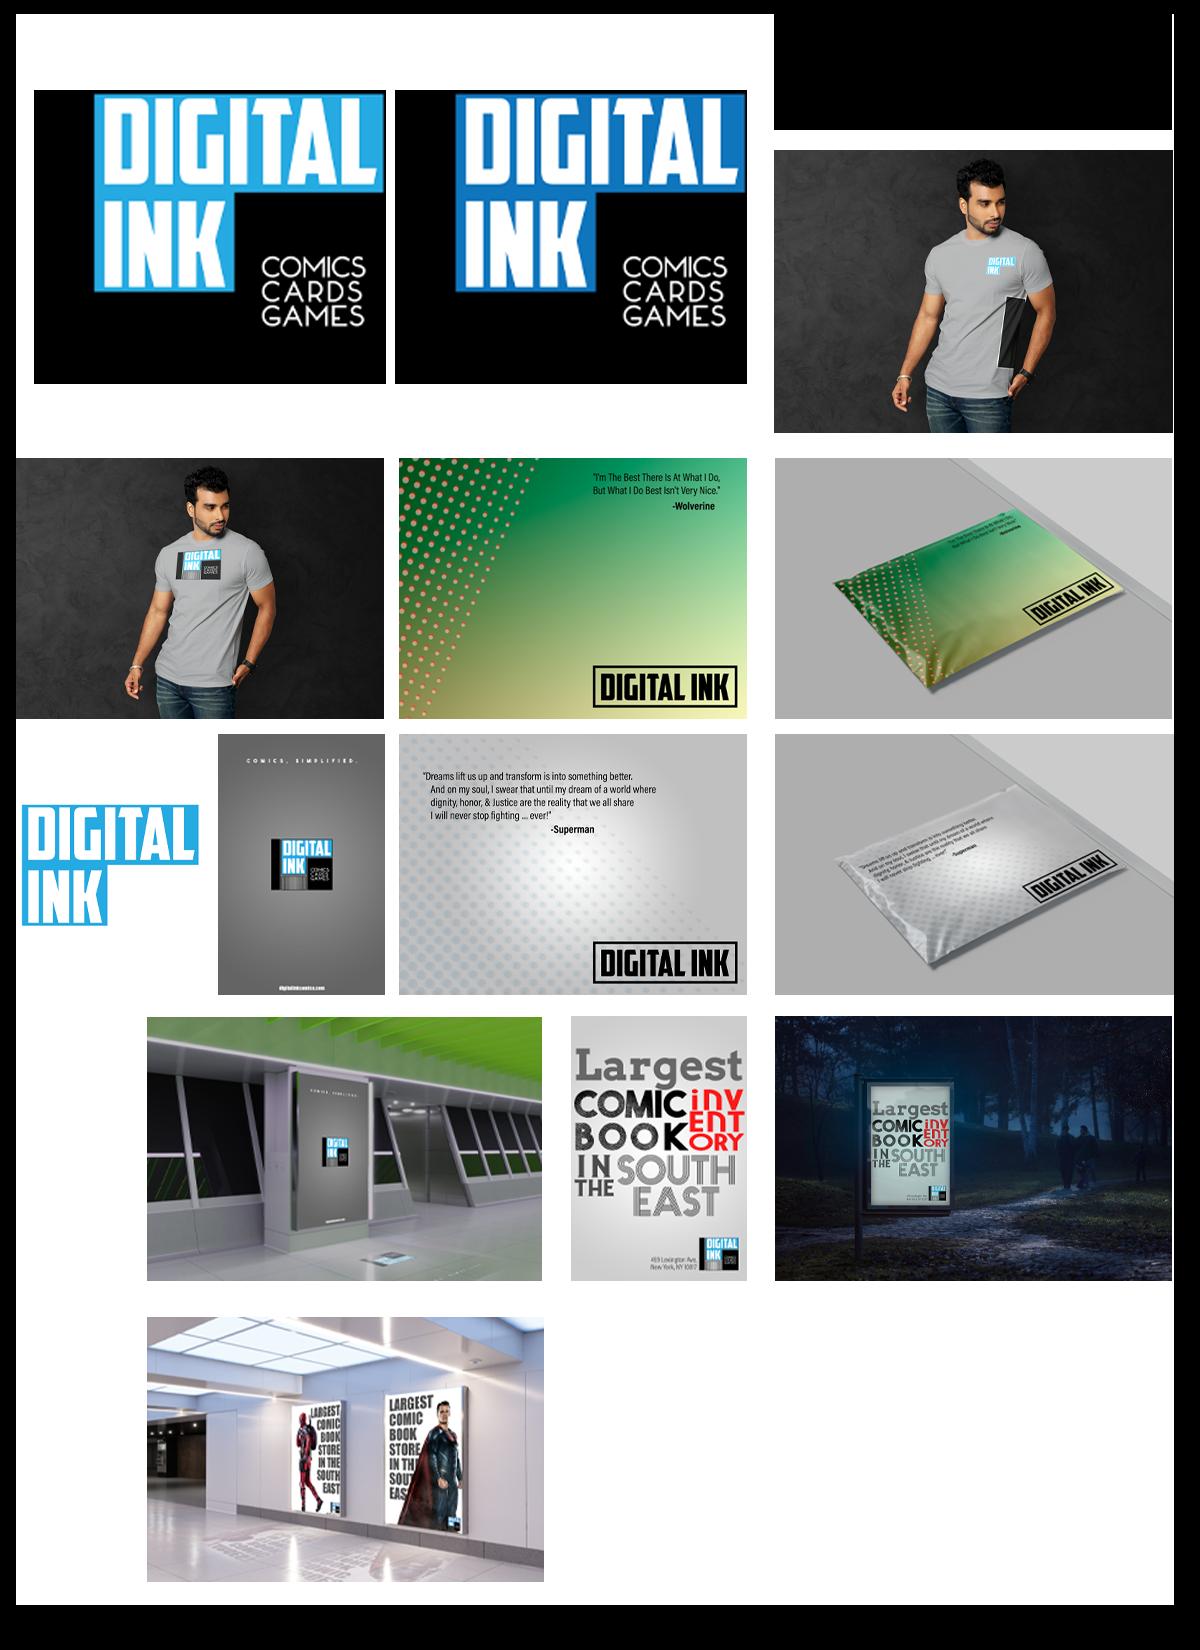 digital ink portfolio graphic.png